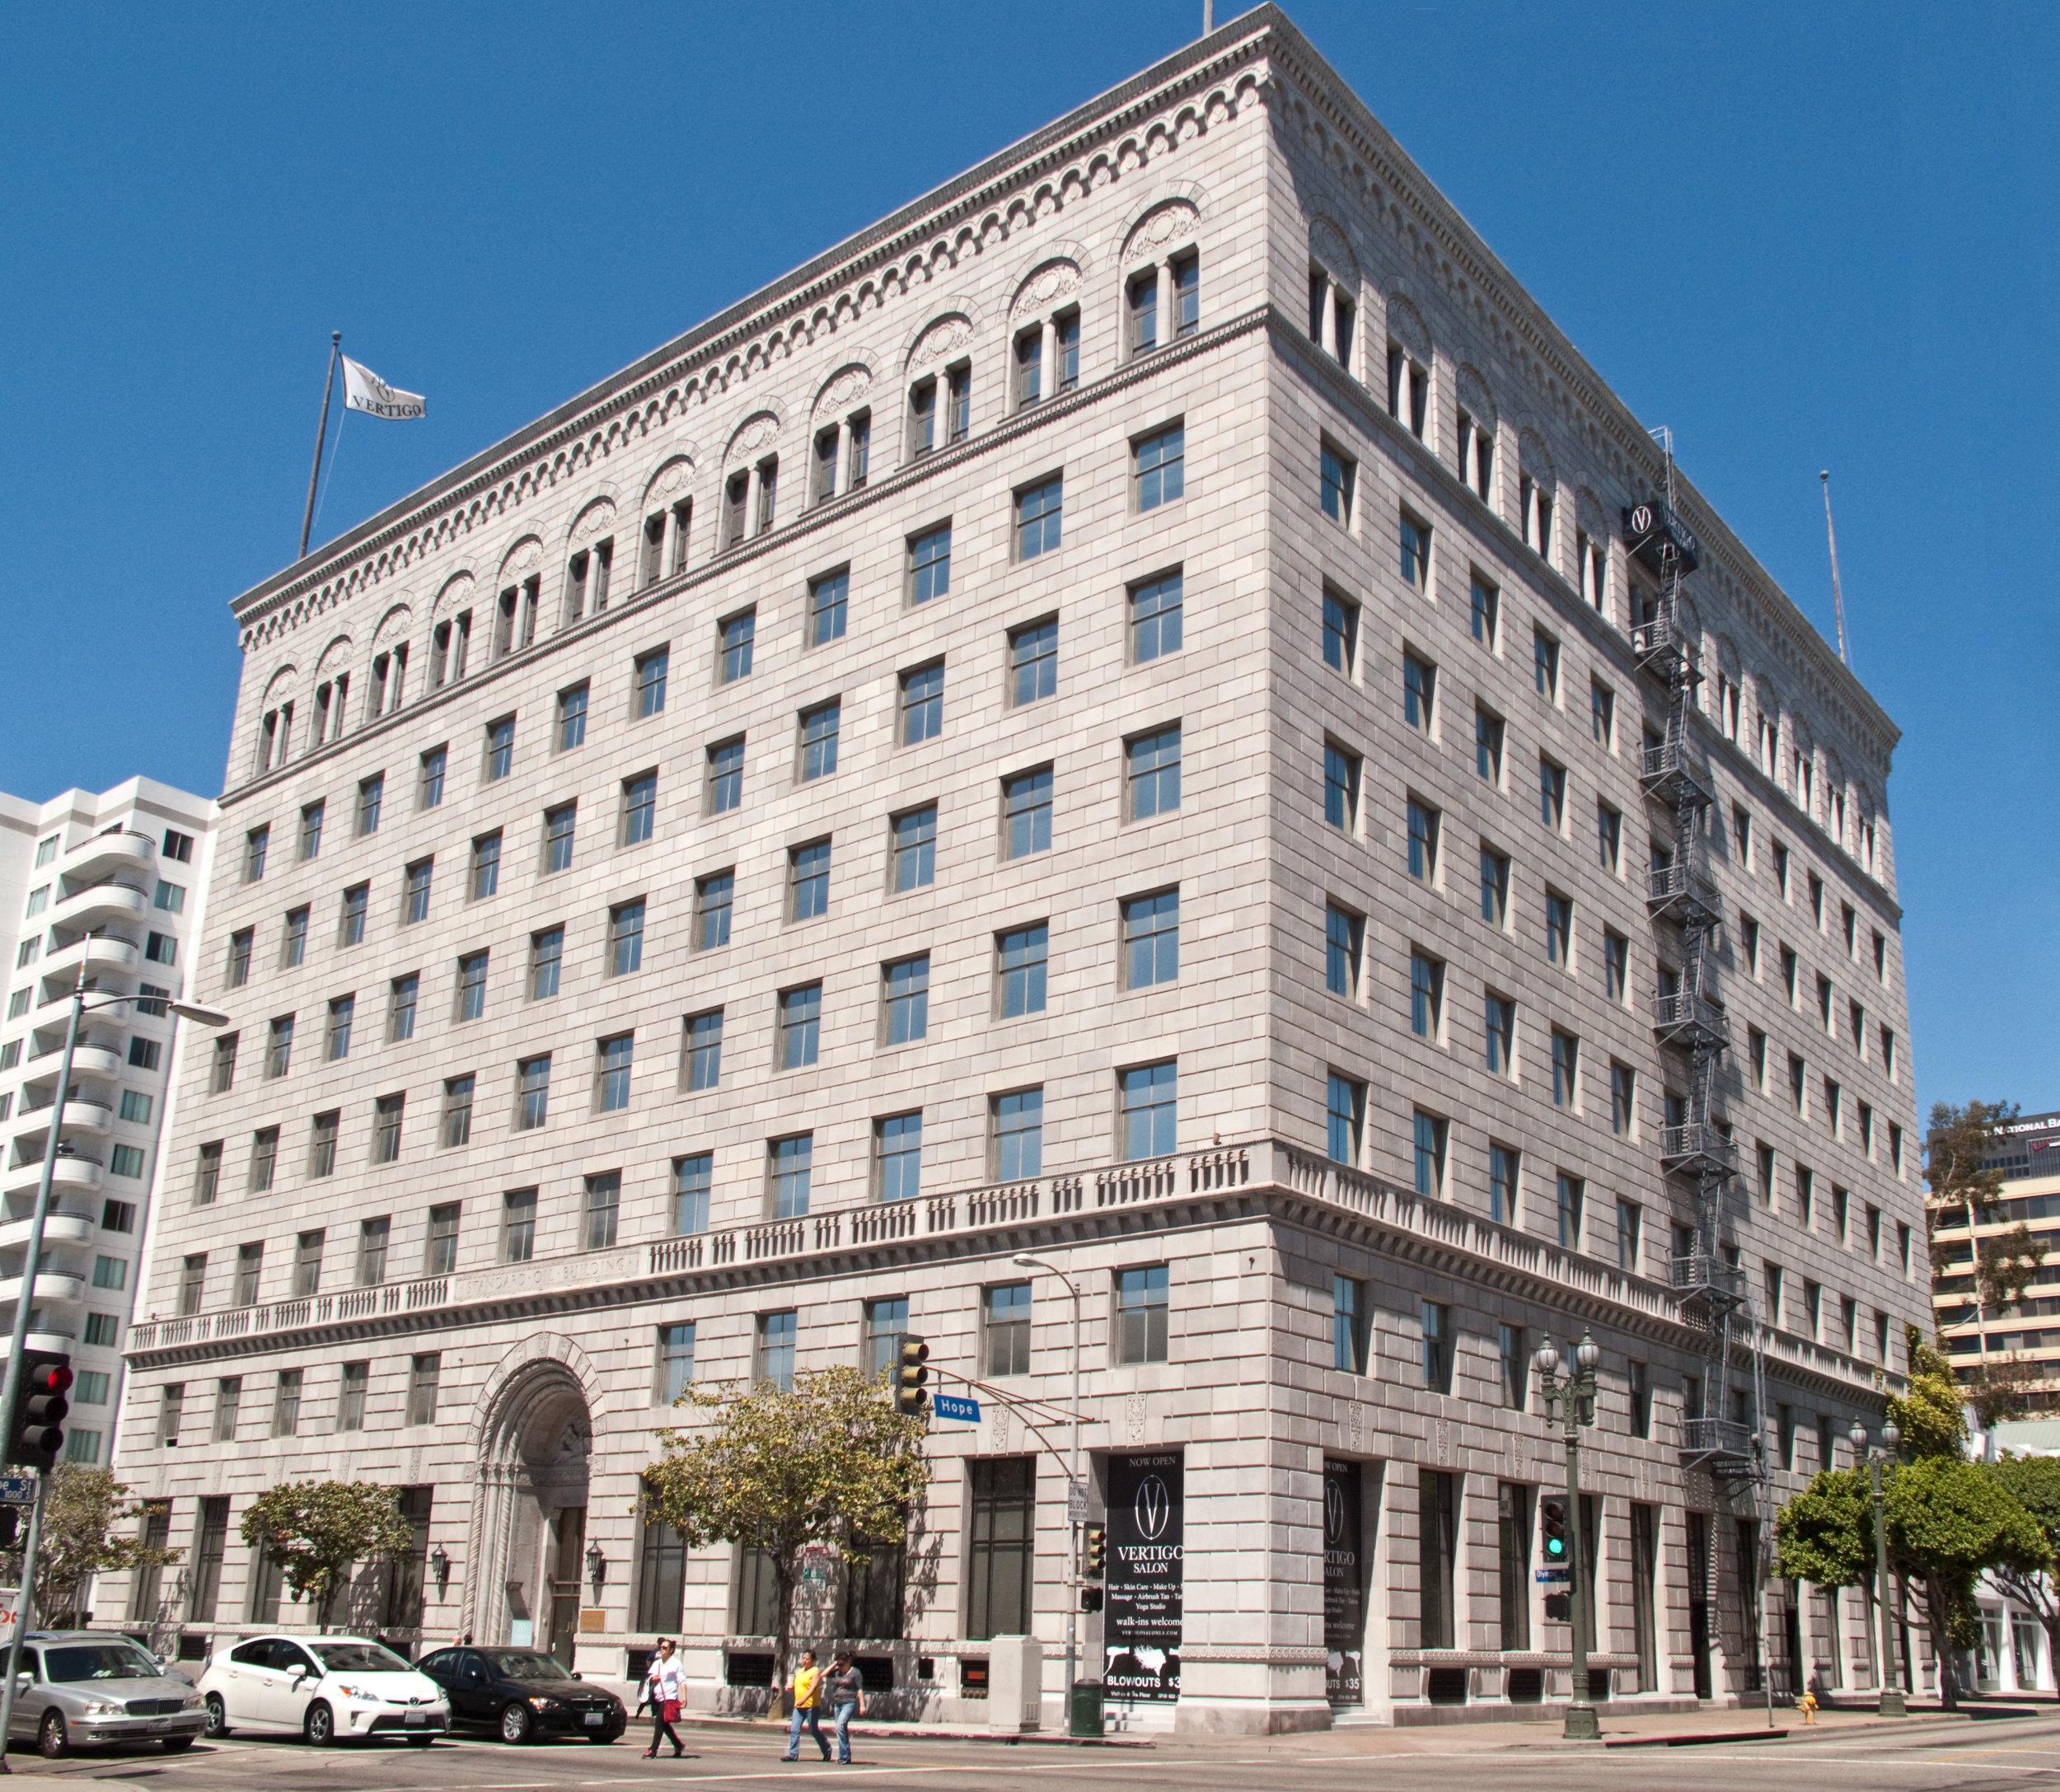 Standard_Oil_Company_Building,_Los_Angeles.jpg